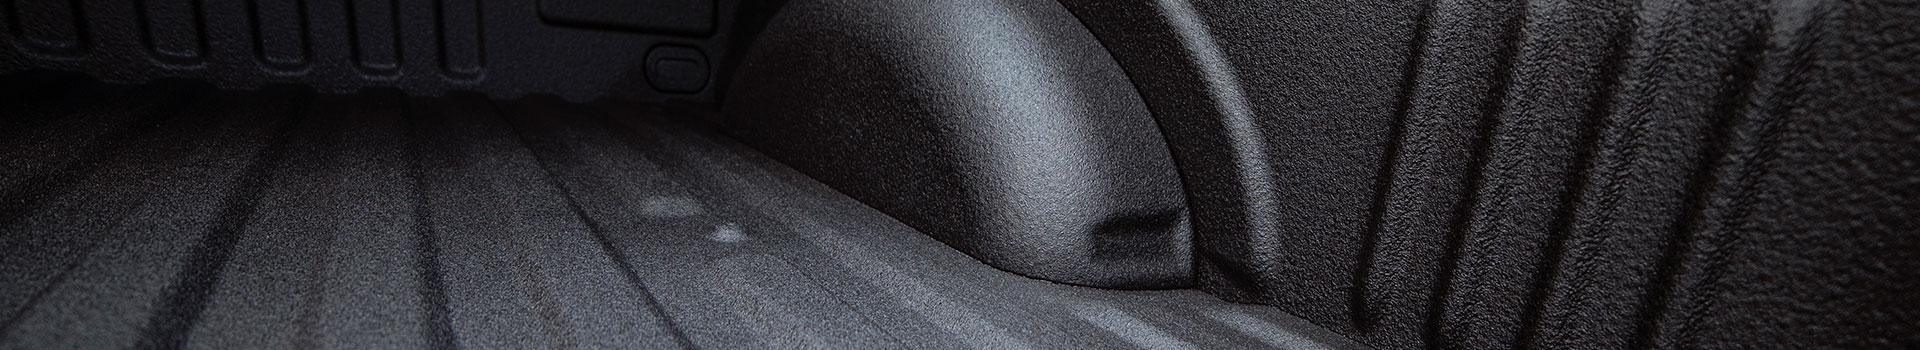 Rhino Linings Spray-On Bed Liner Banner 1